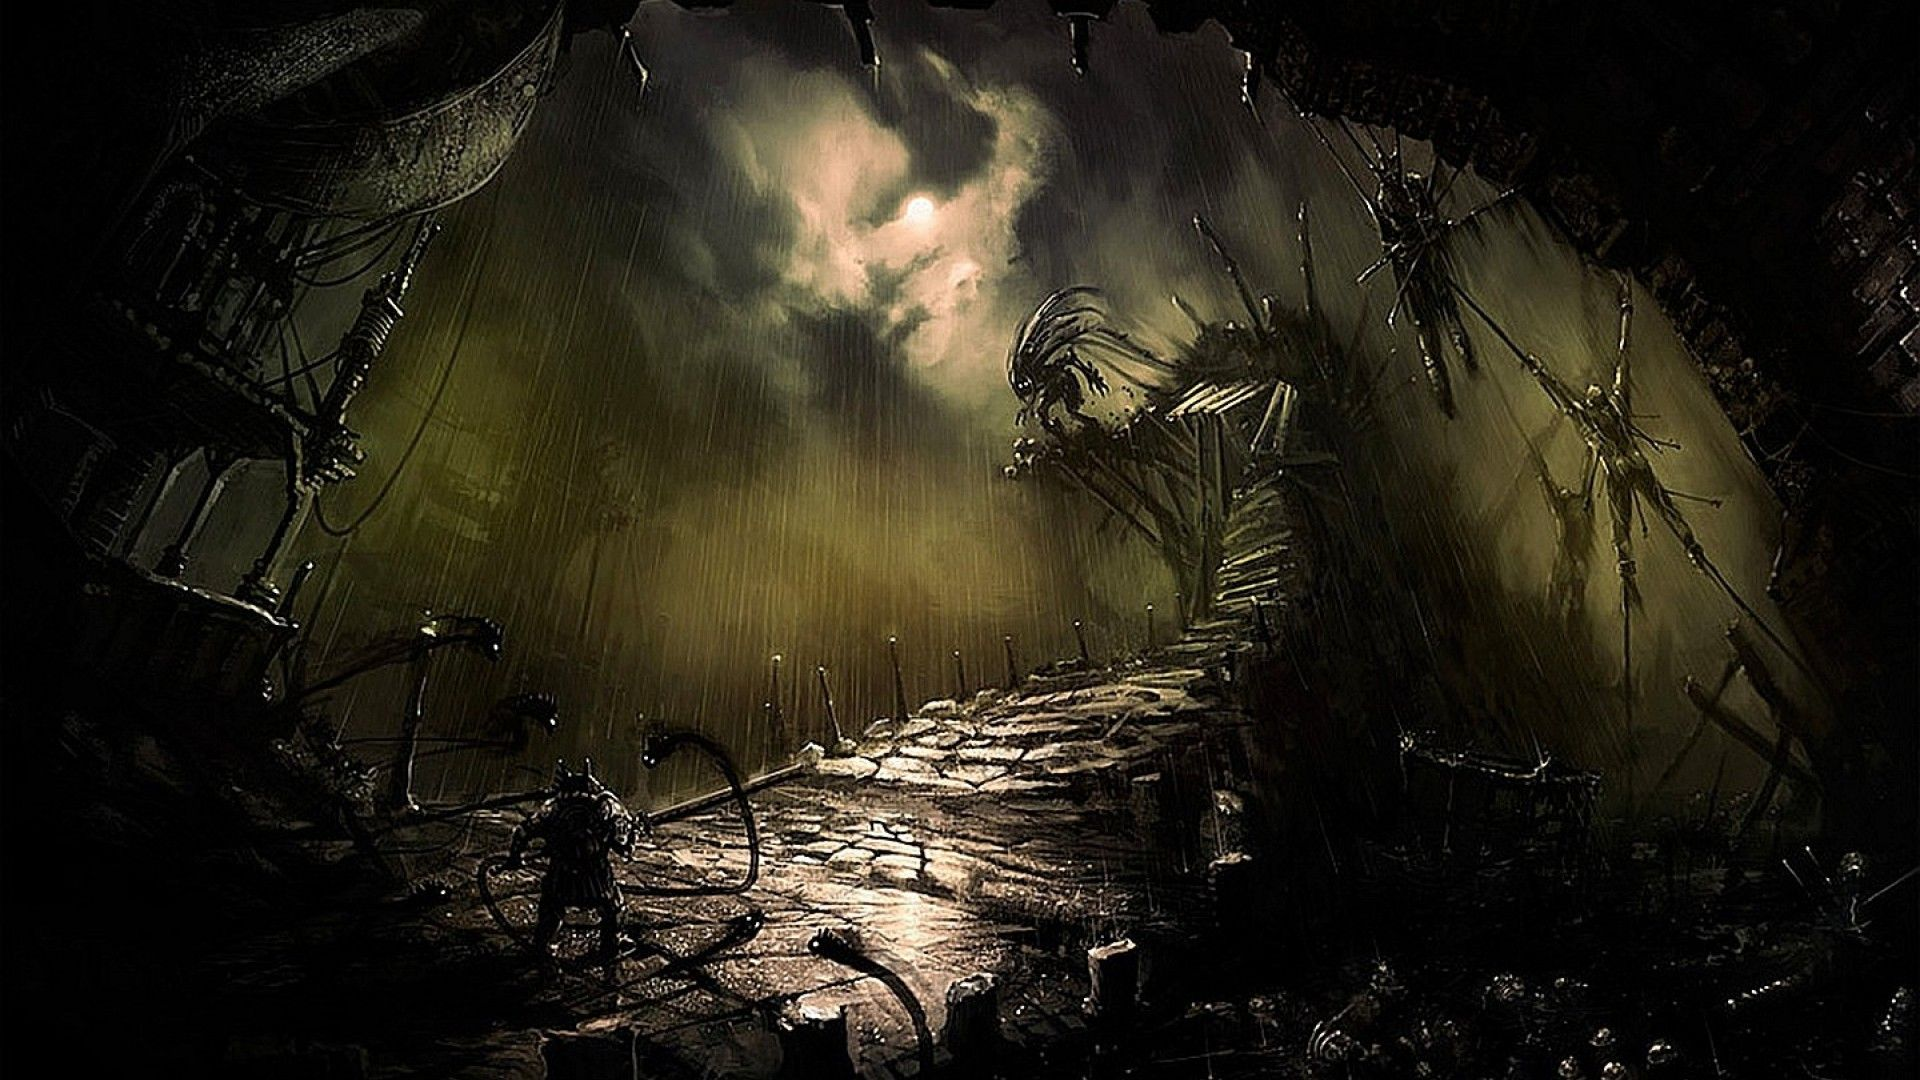 Horror artwork. Talk about a dark landscape Evil art